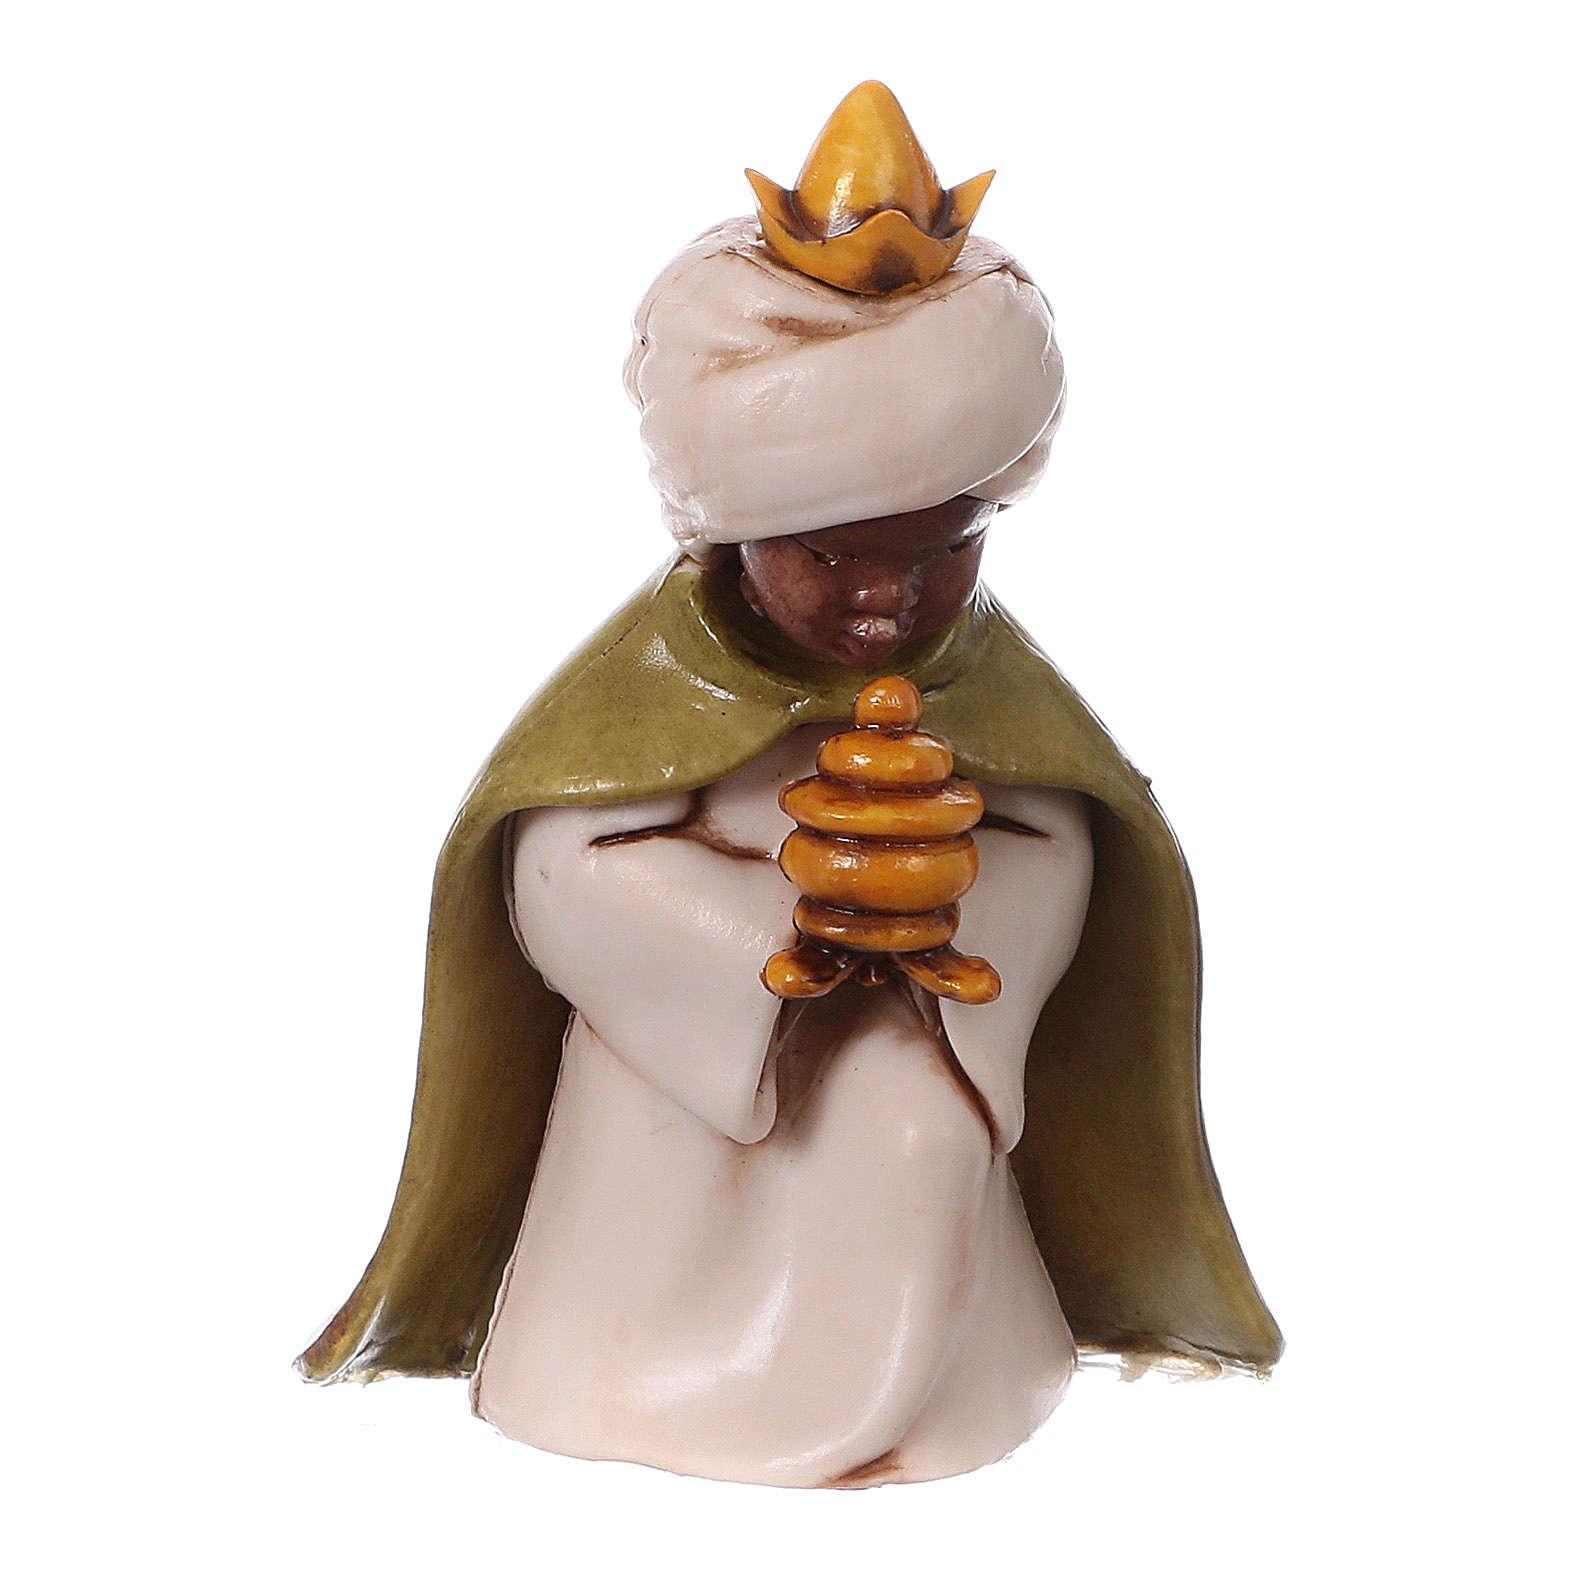 PVC Wise Men, Moranduzzo Nativity scene 7 cm, Children's Line 4